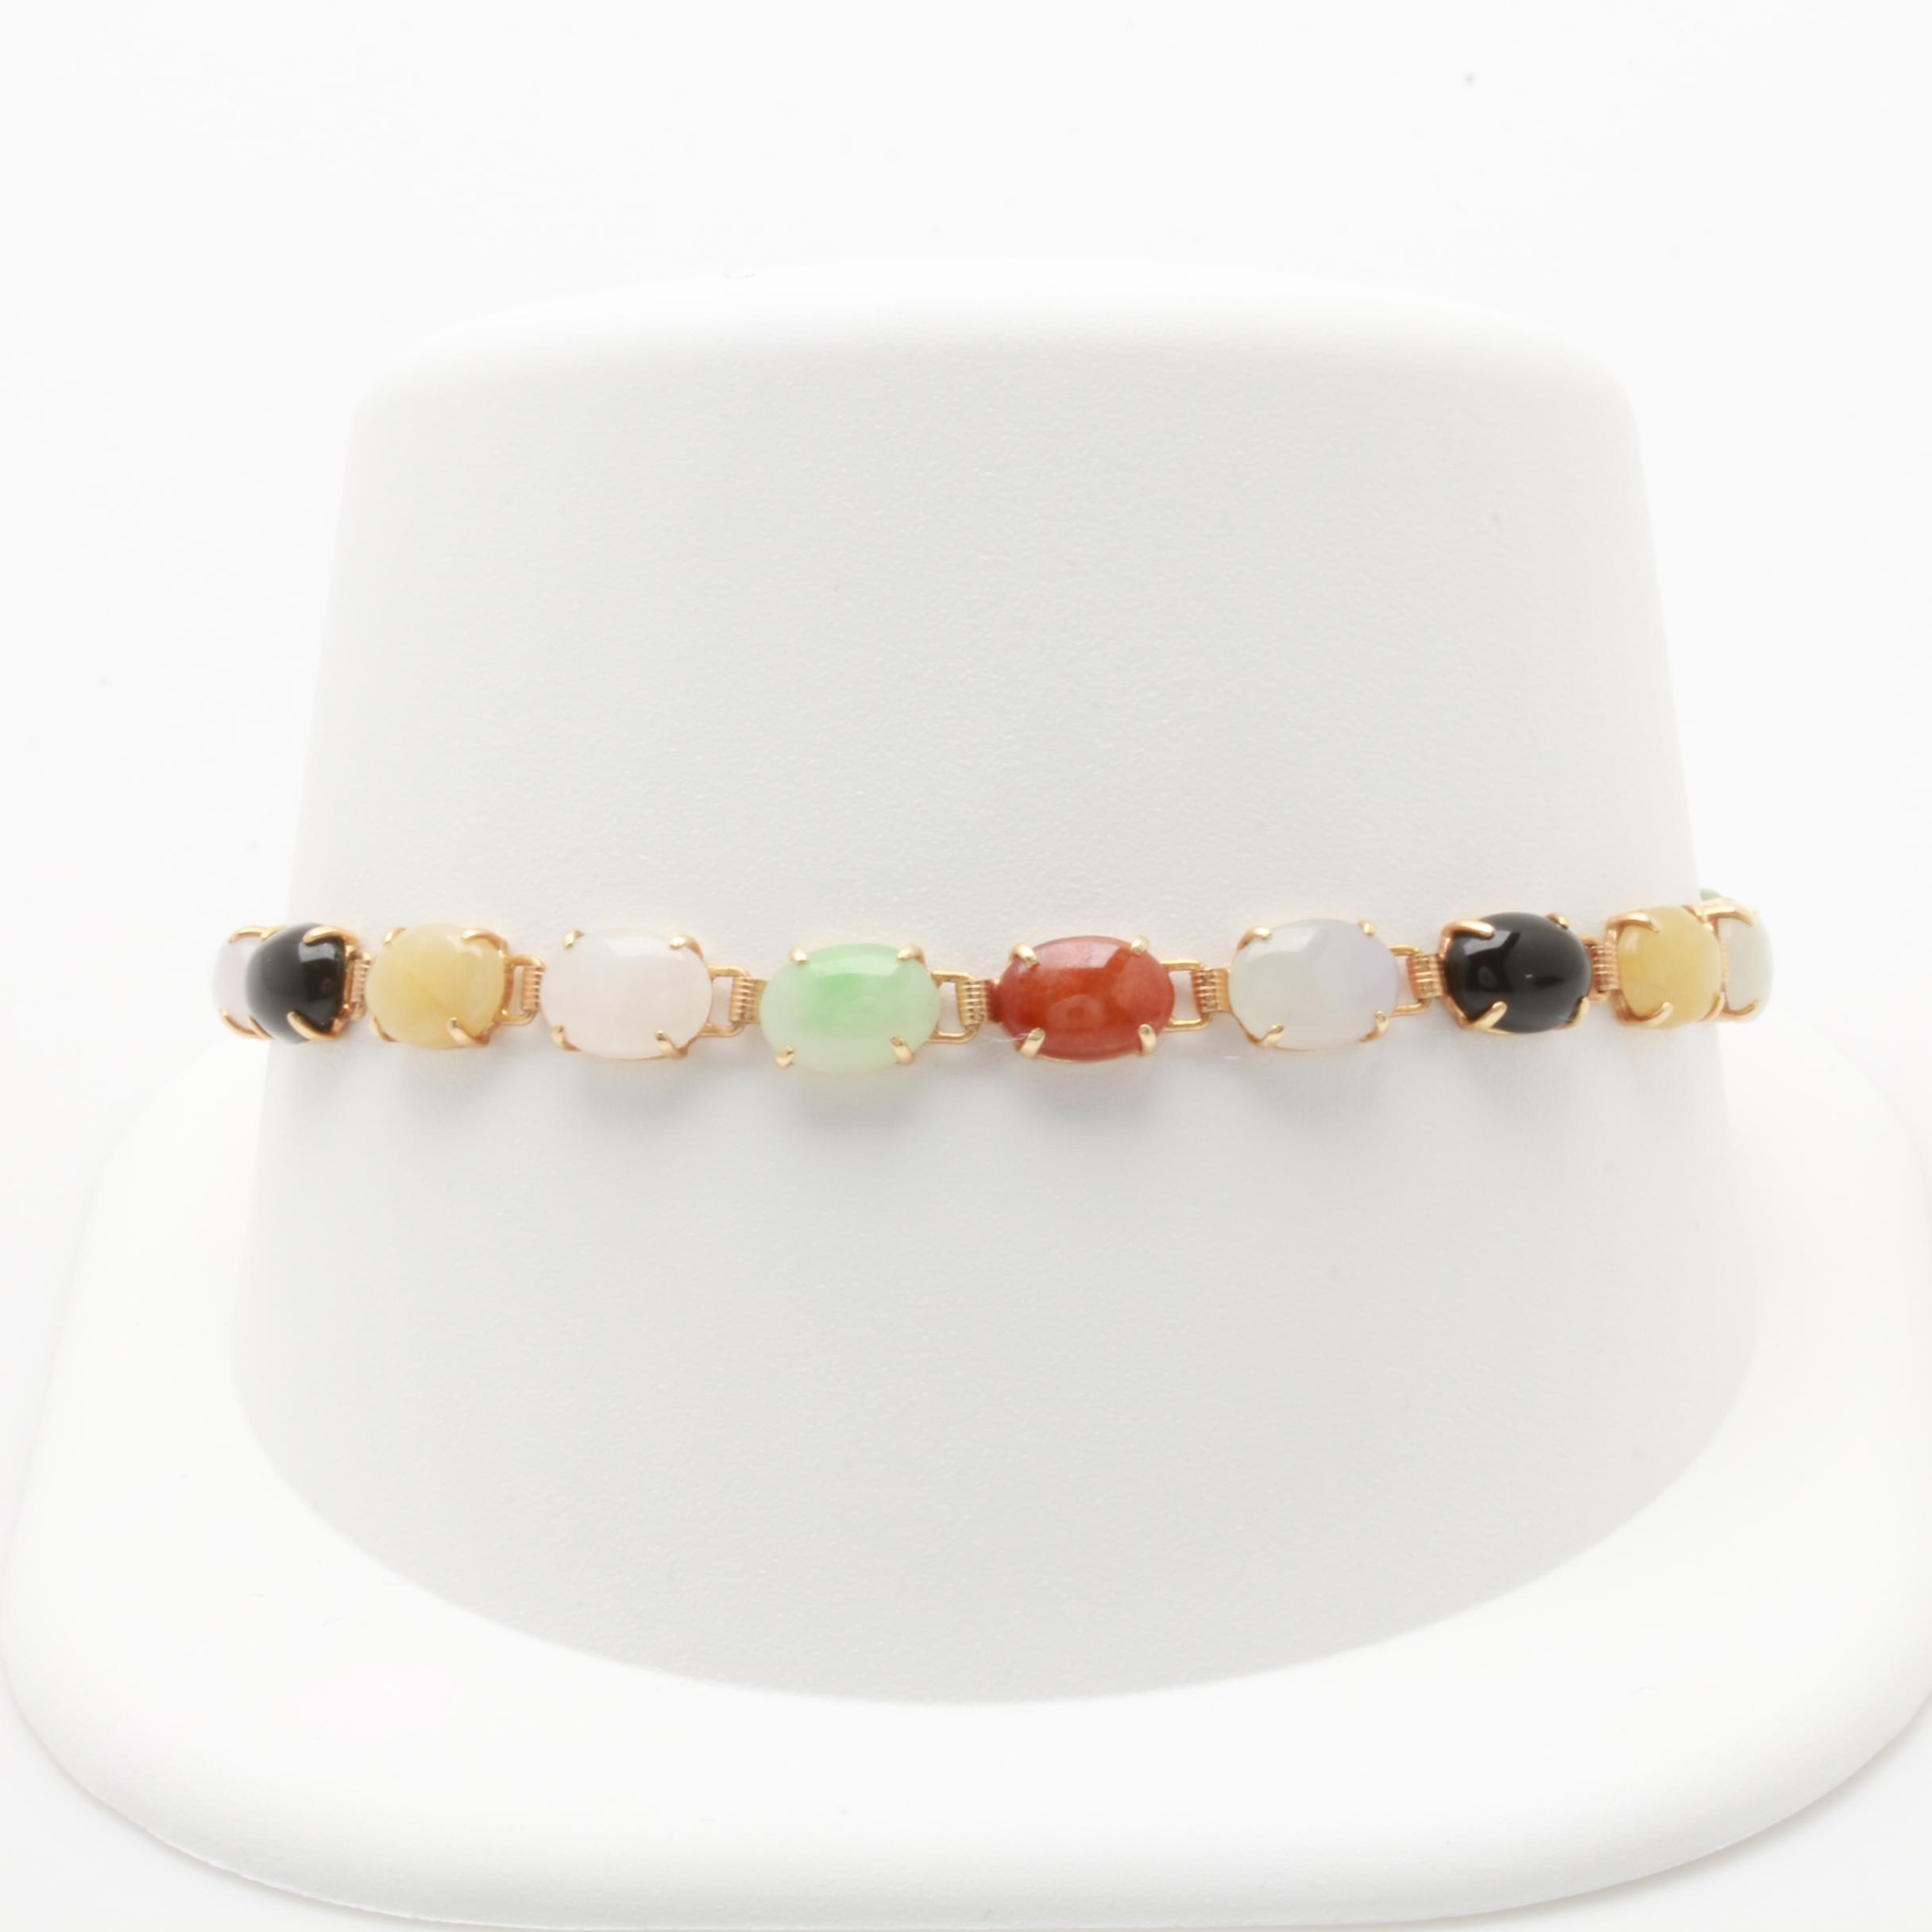 14K Yellow Gold Jadeite and Black Onyx Bracelet